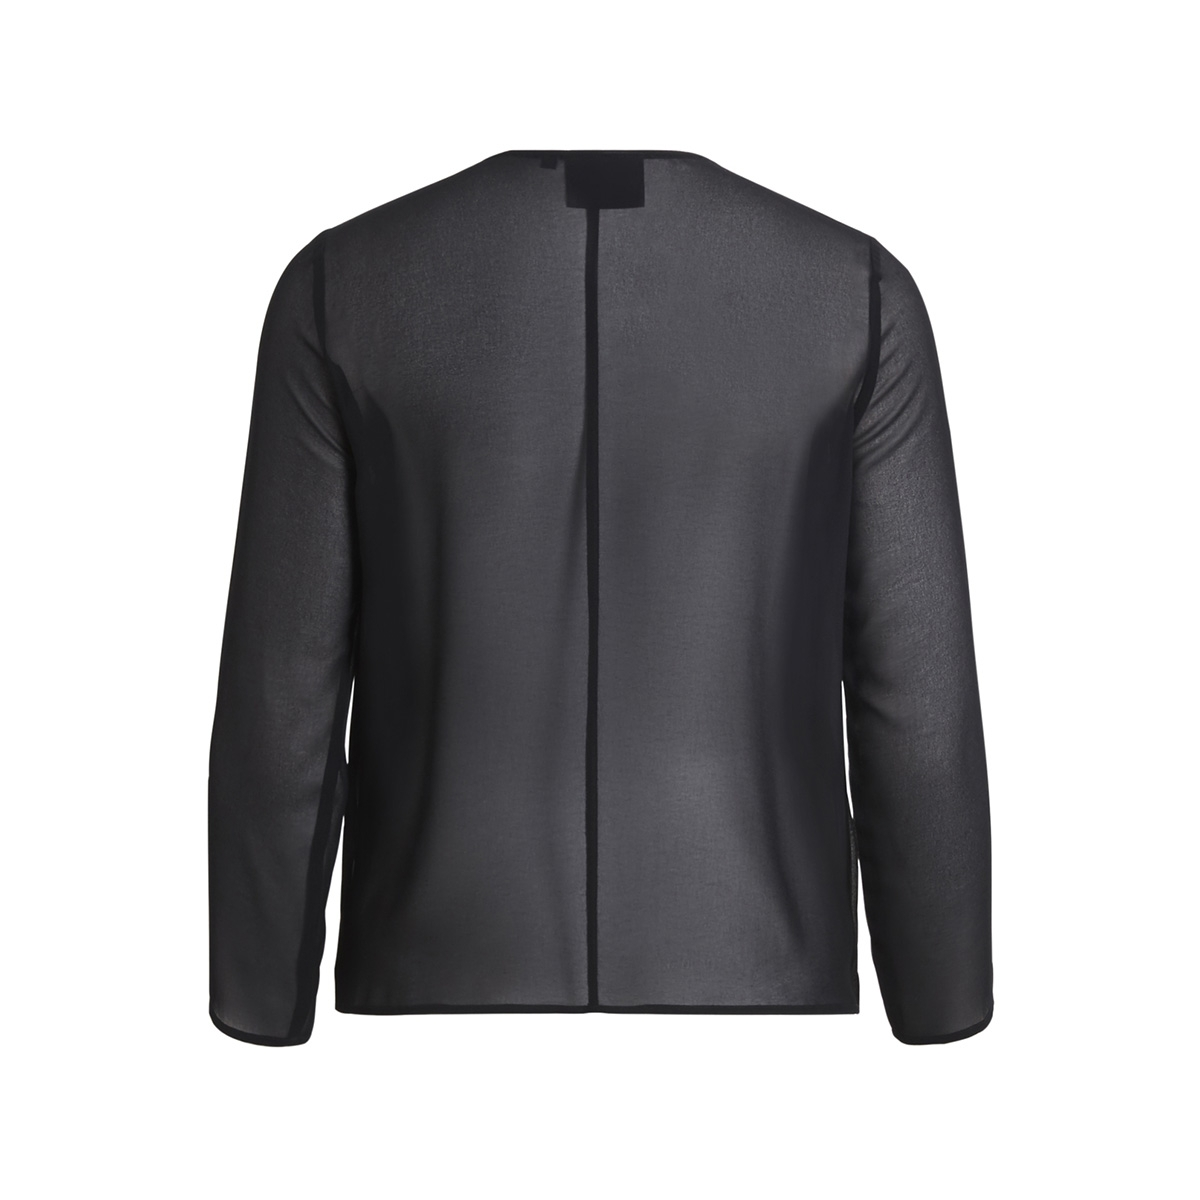 objsabah l/s top apb 23025772 object blouse black